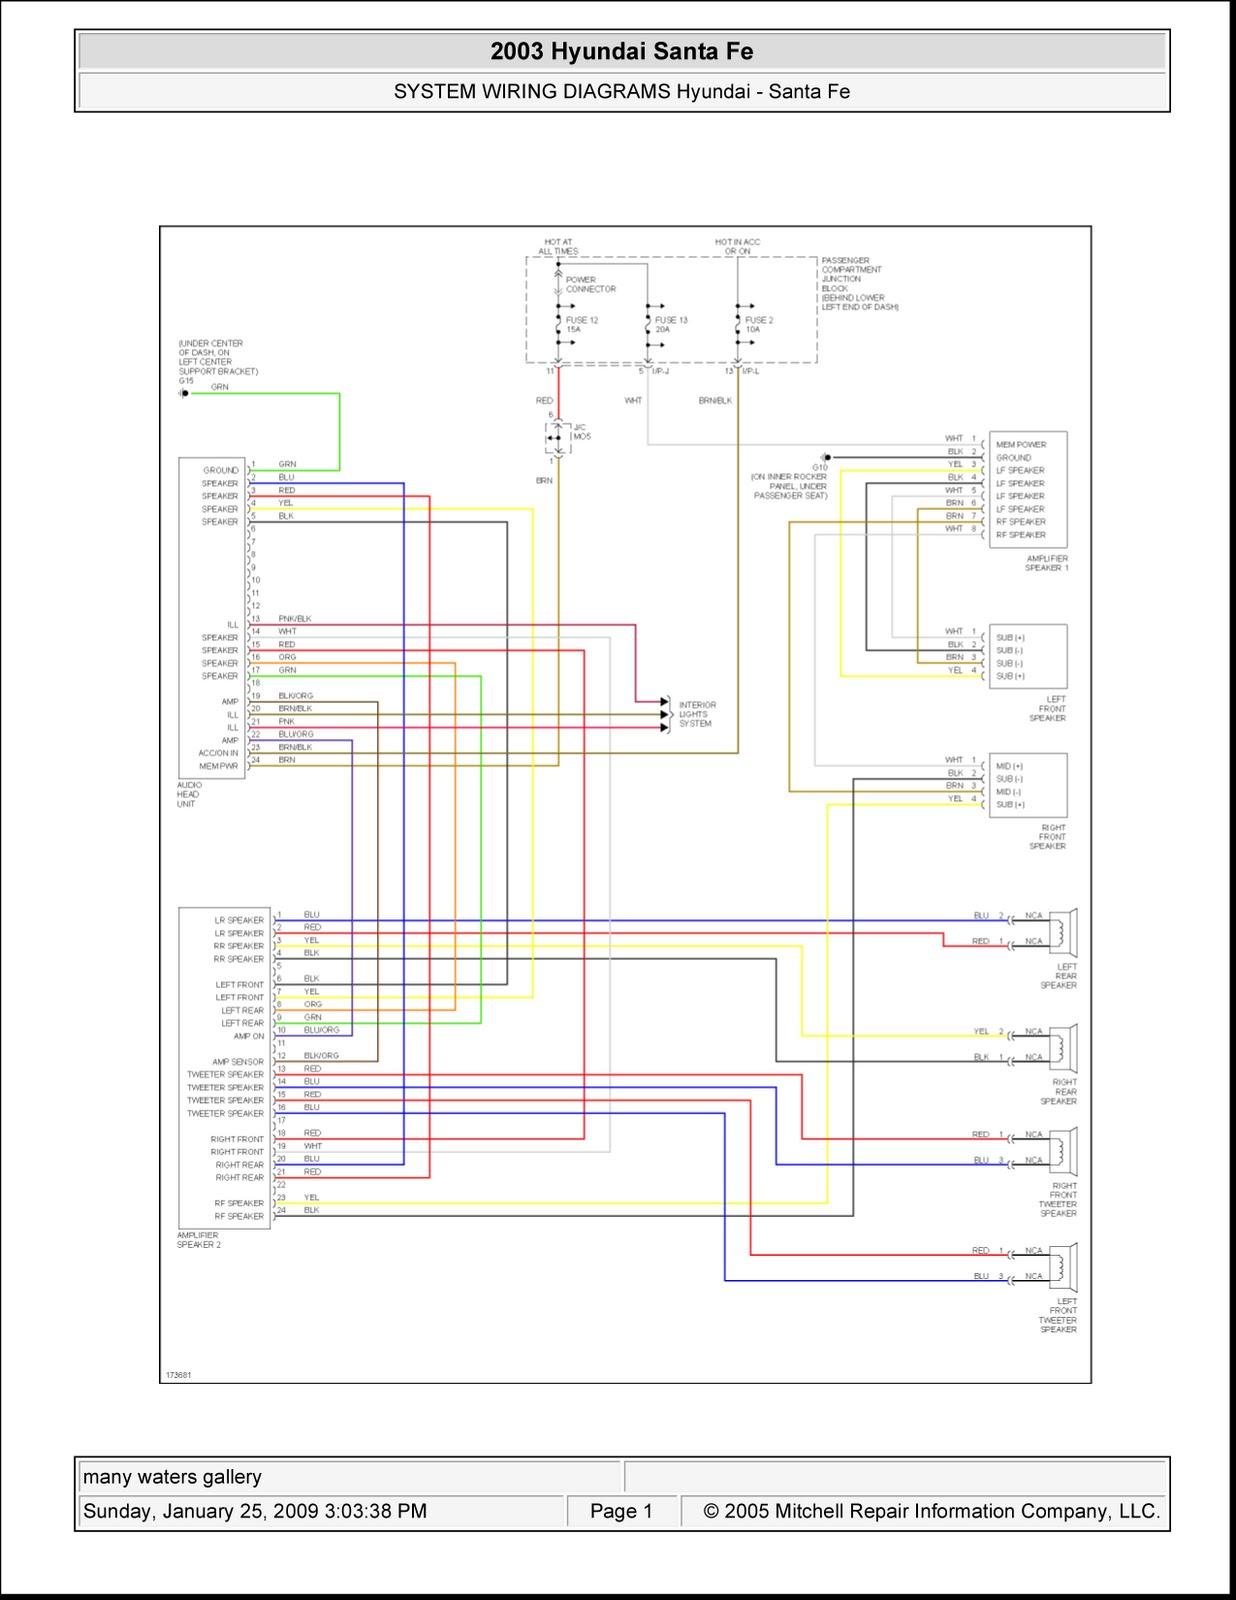 Phenomenal 2005 Hyundai Elantra Stereo Wiring Diagram Diagram Data Schema Wiring Cloud Staixaidewilluminateatxorg